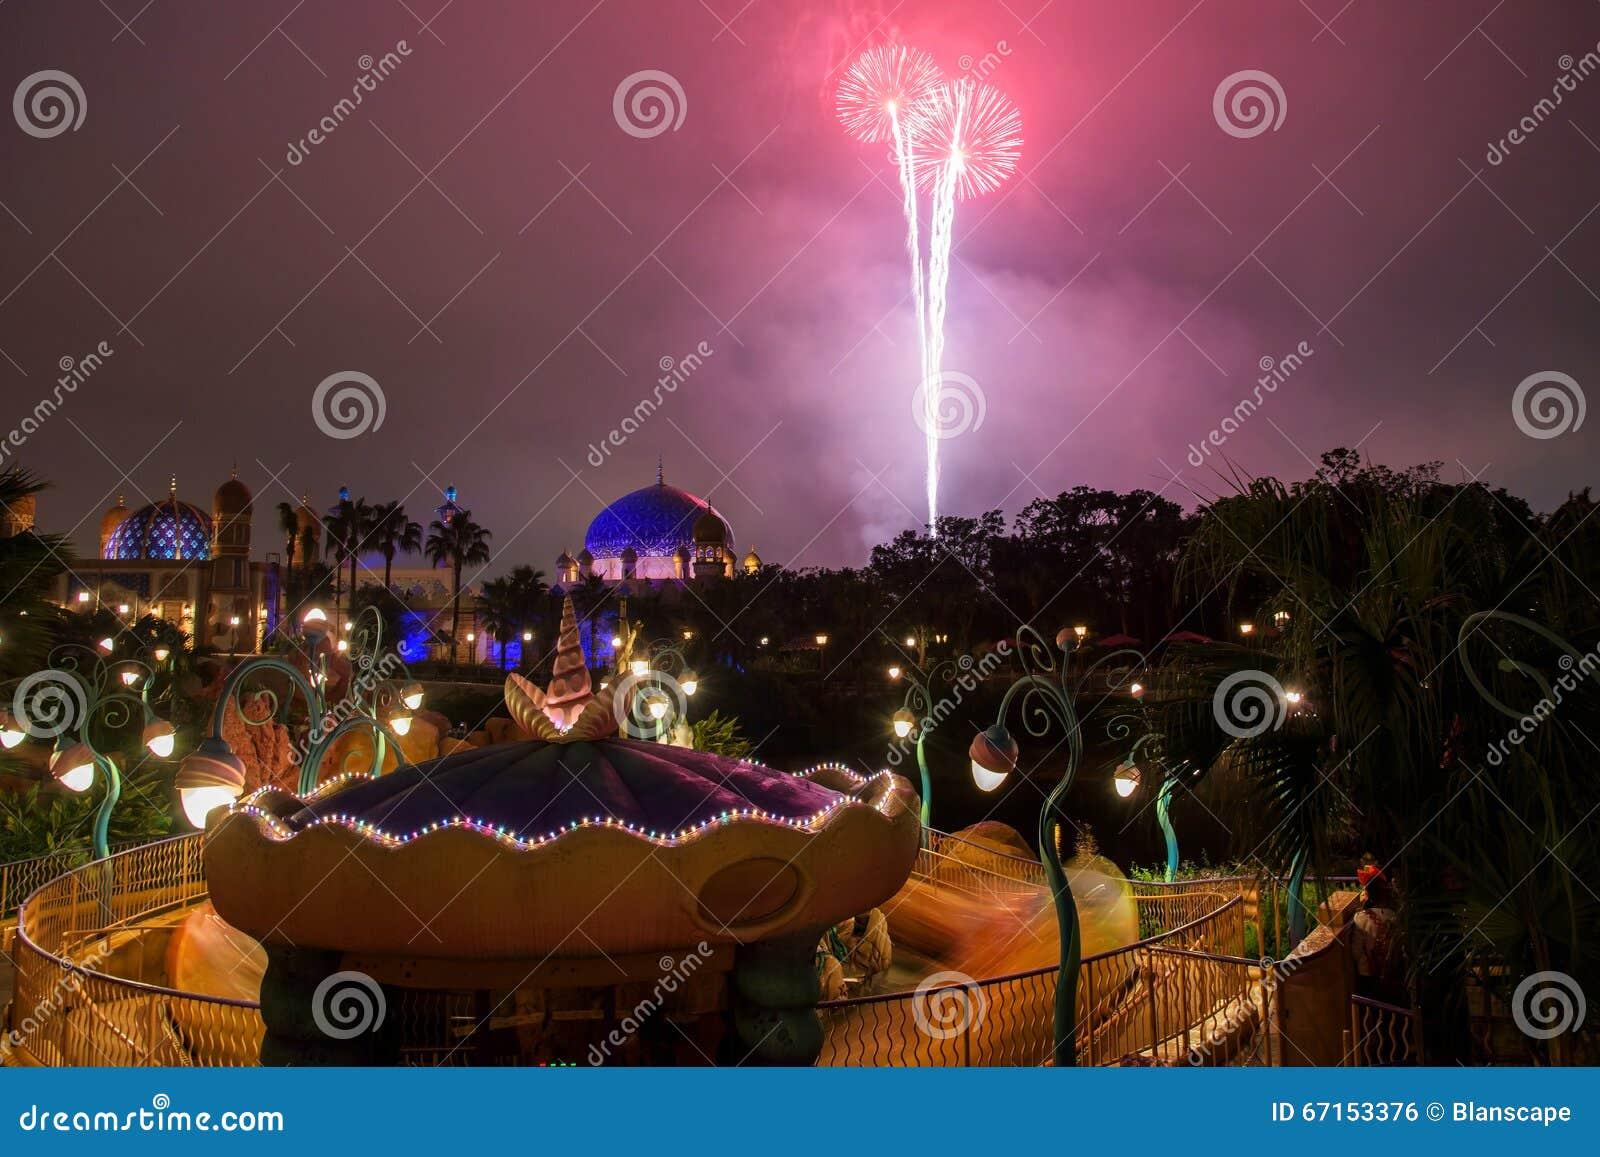 Tokyo Japan November 08 2015 Firework Above Arabian Coast Building At Tokyo Disney Sea Opened In  Acres Area